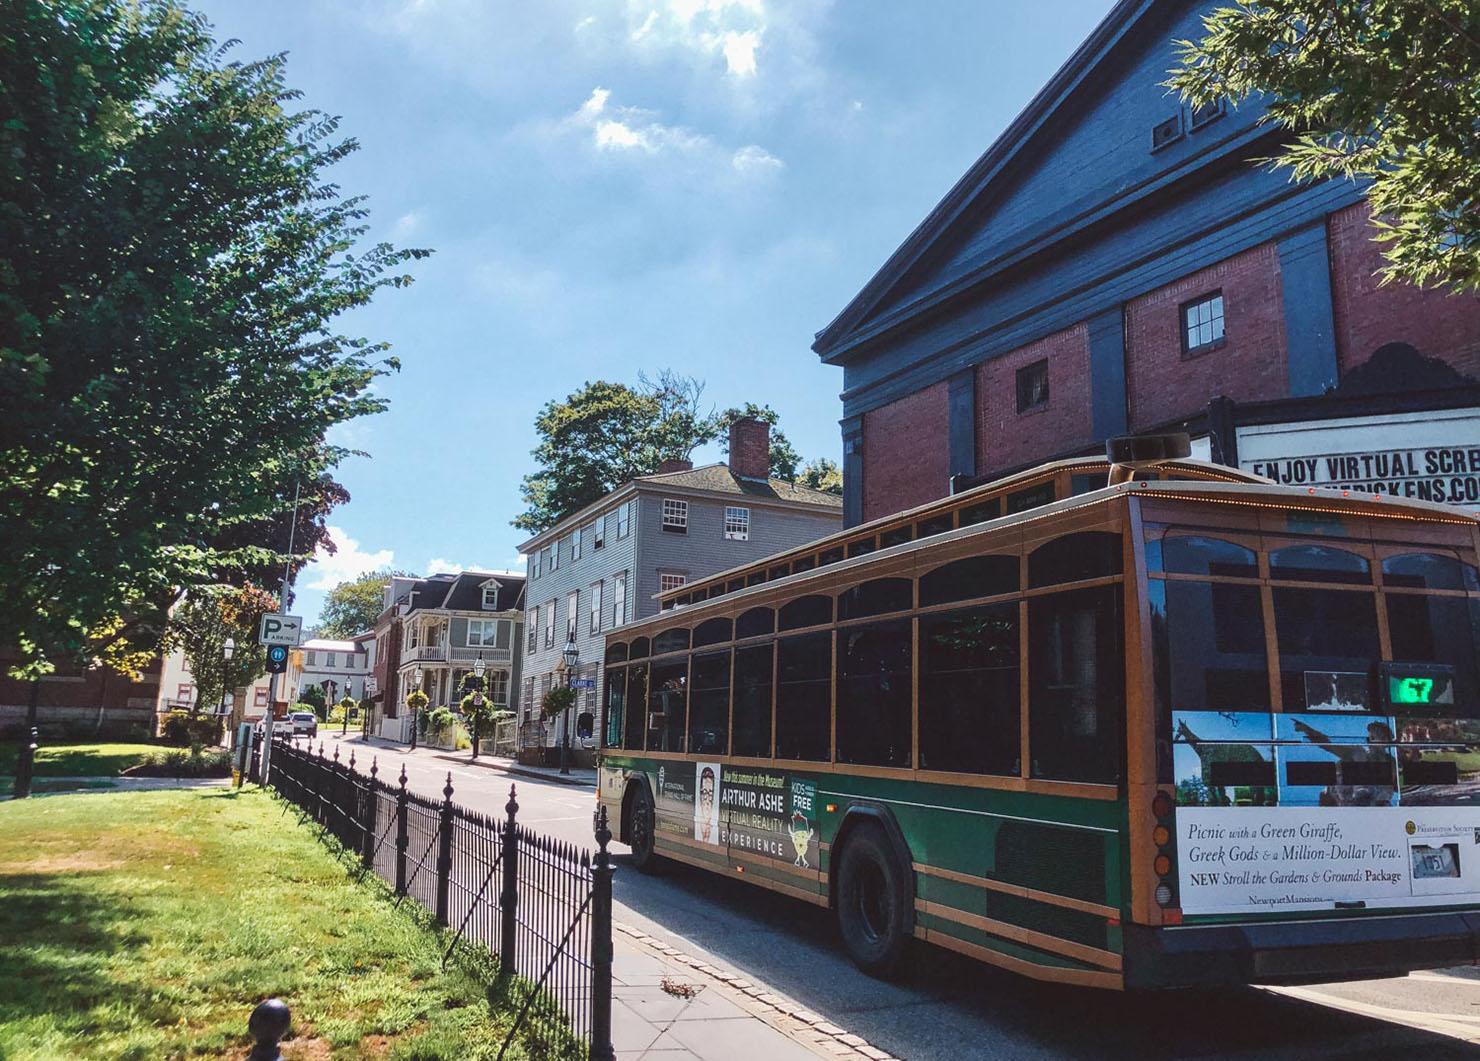 RIPTA 67 Line Trolley